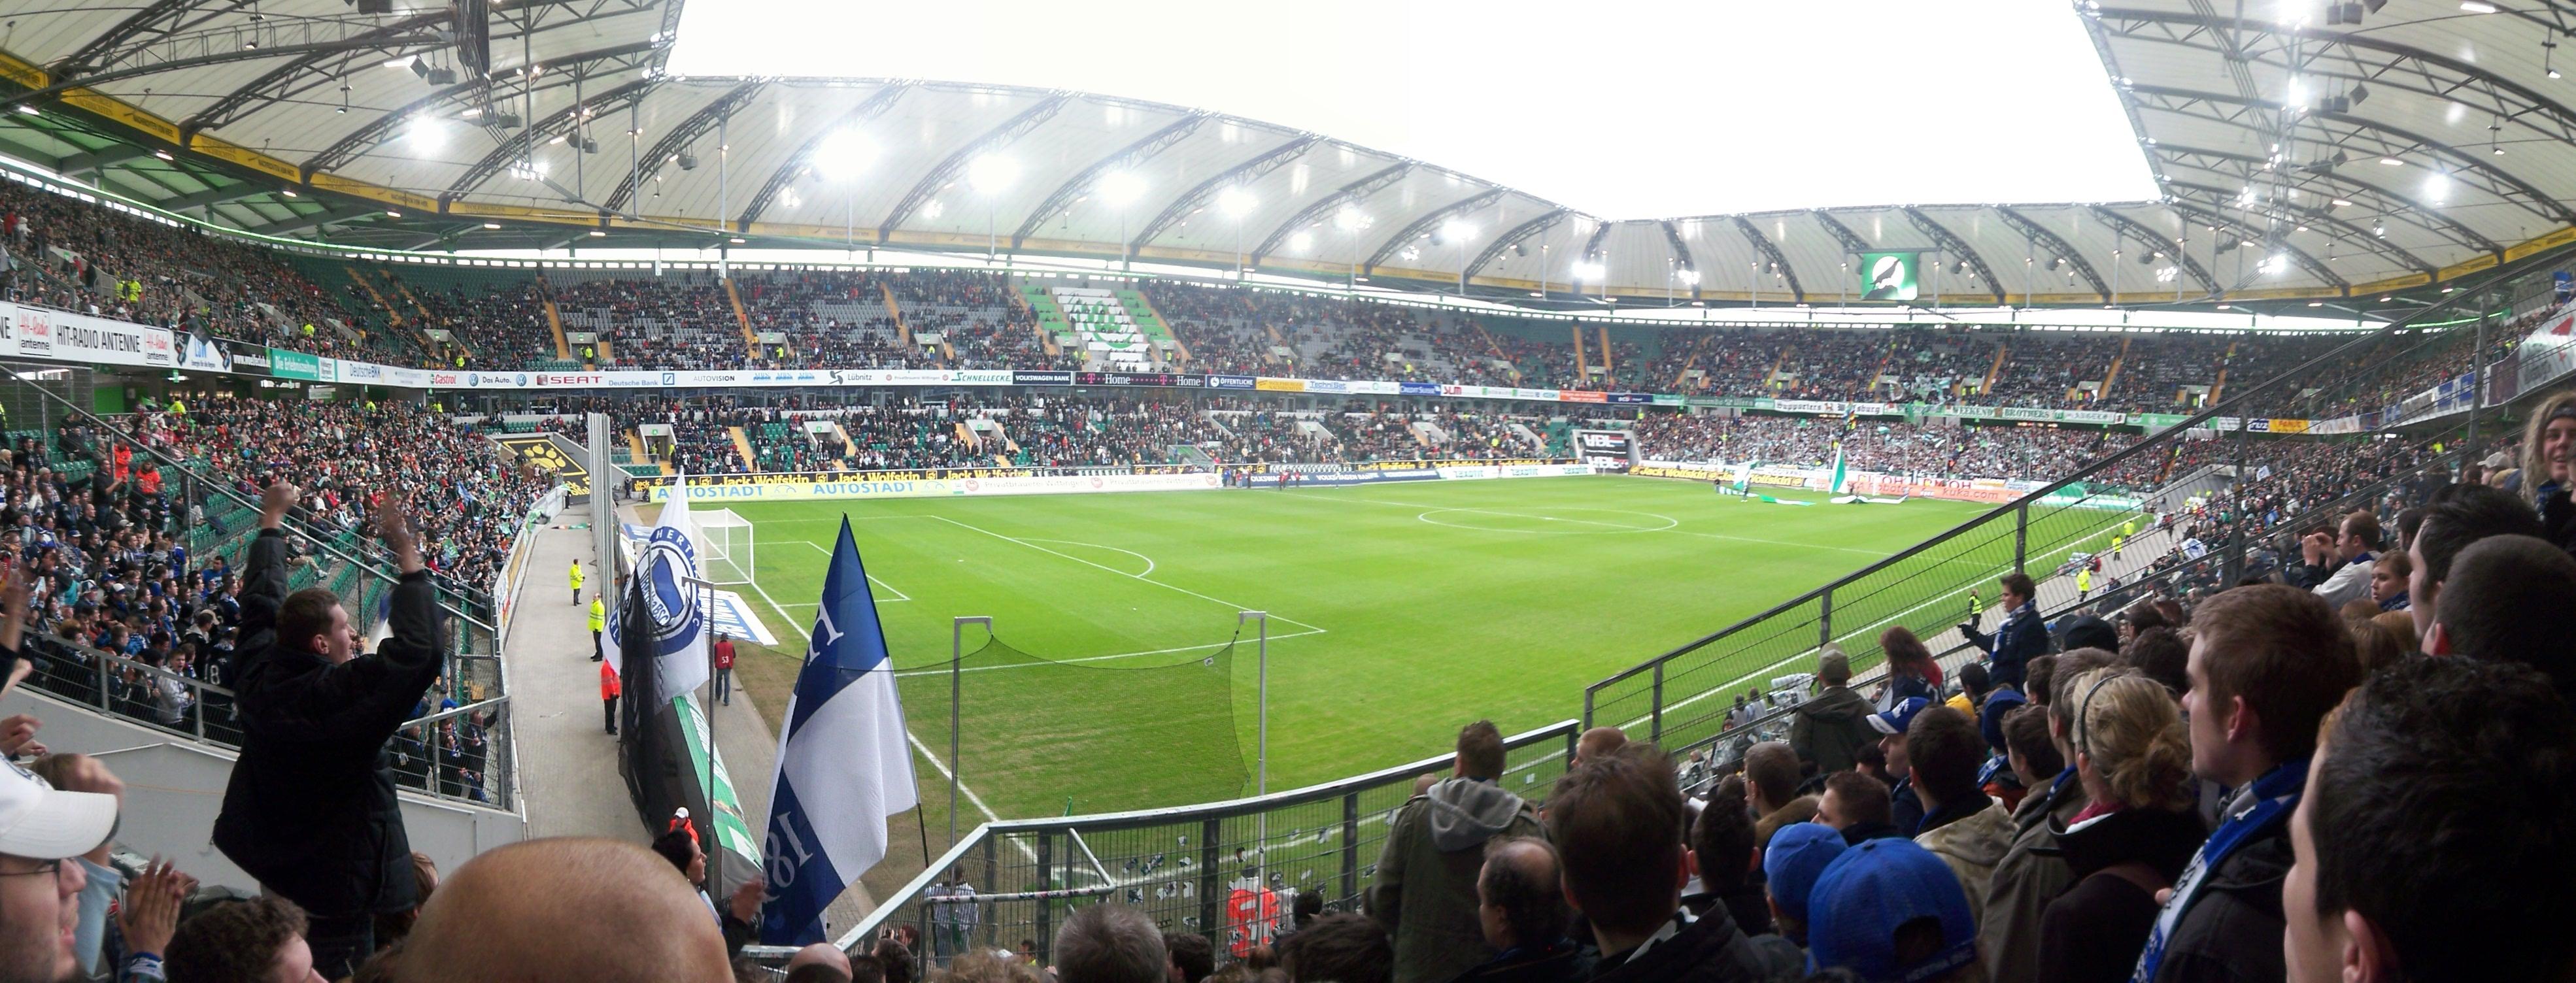 Nechar Wallpaper 3d Match Thread Vfl Wolfsburg Vs Manchester United Reddevils